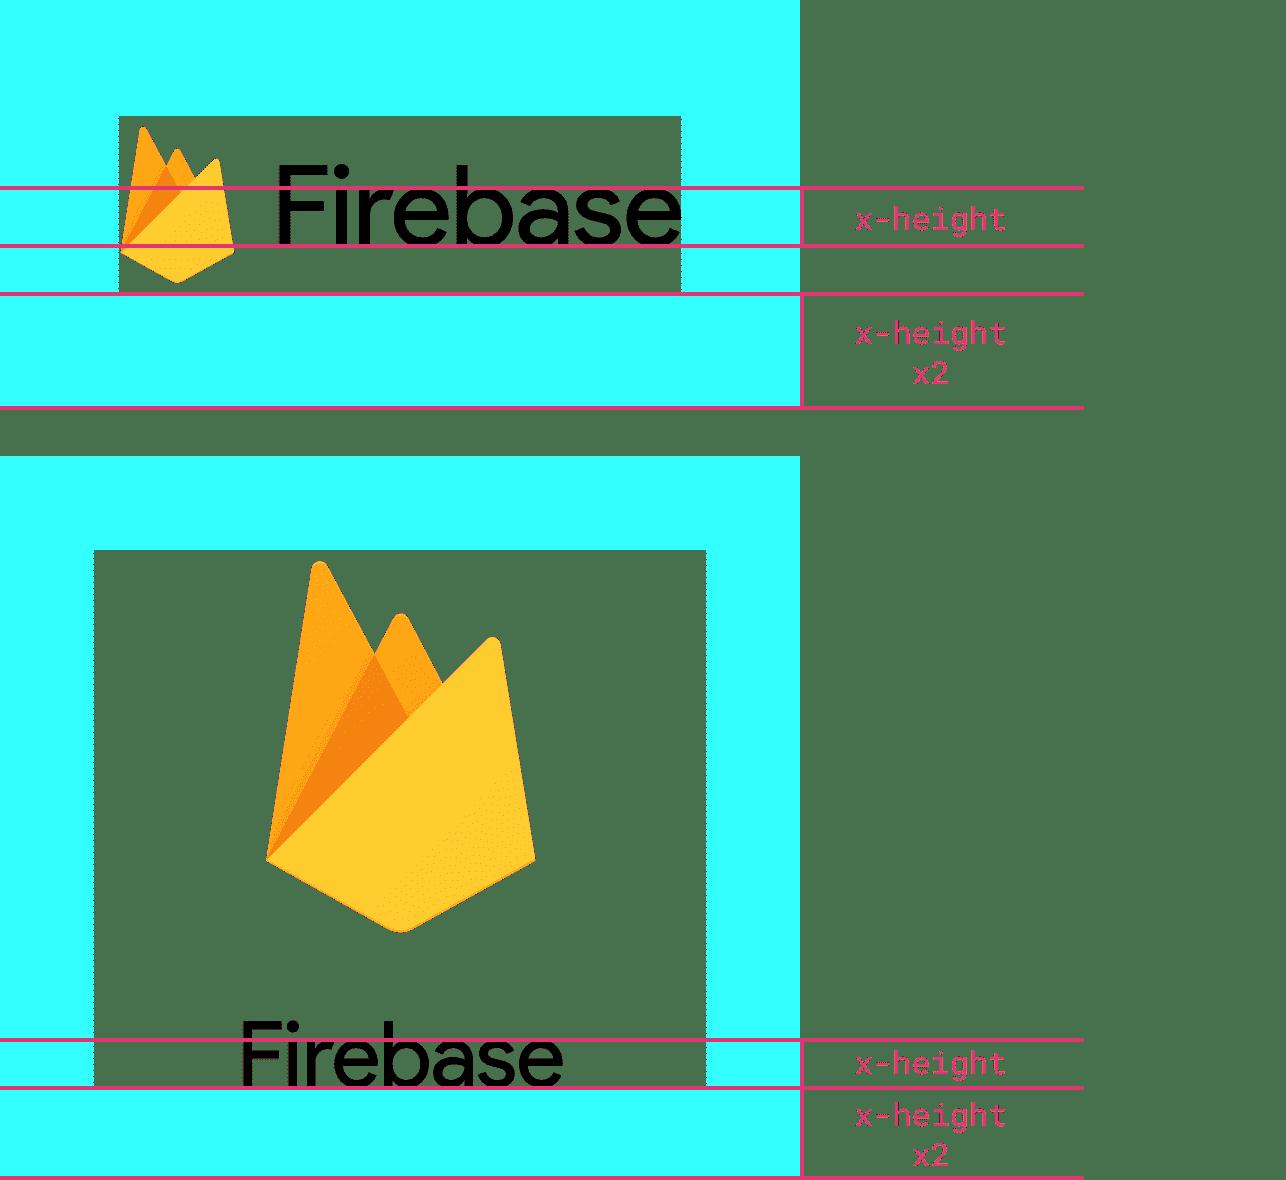 Firebase 徽标示例,高度至少为正常徽标的两倍